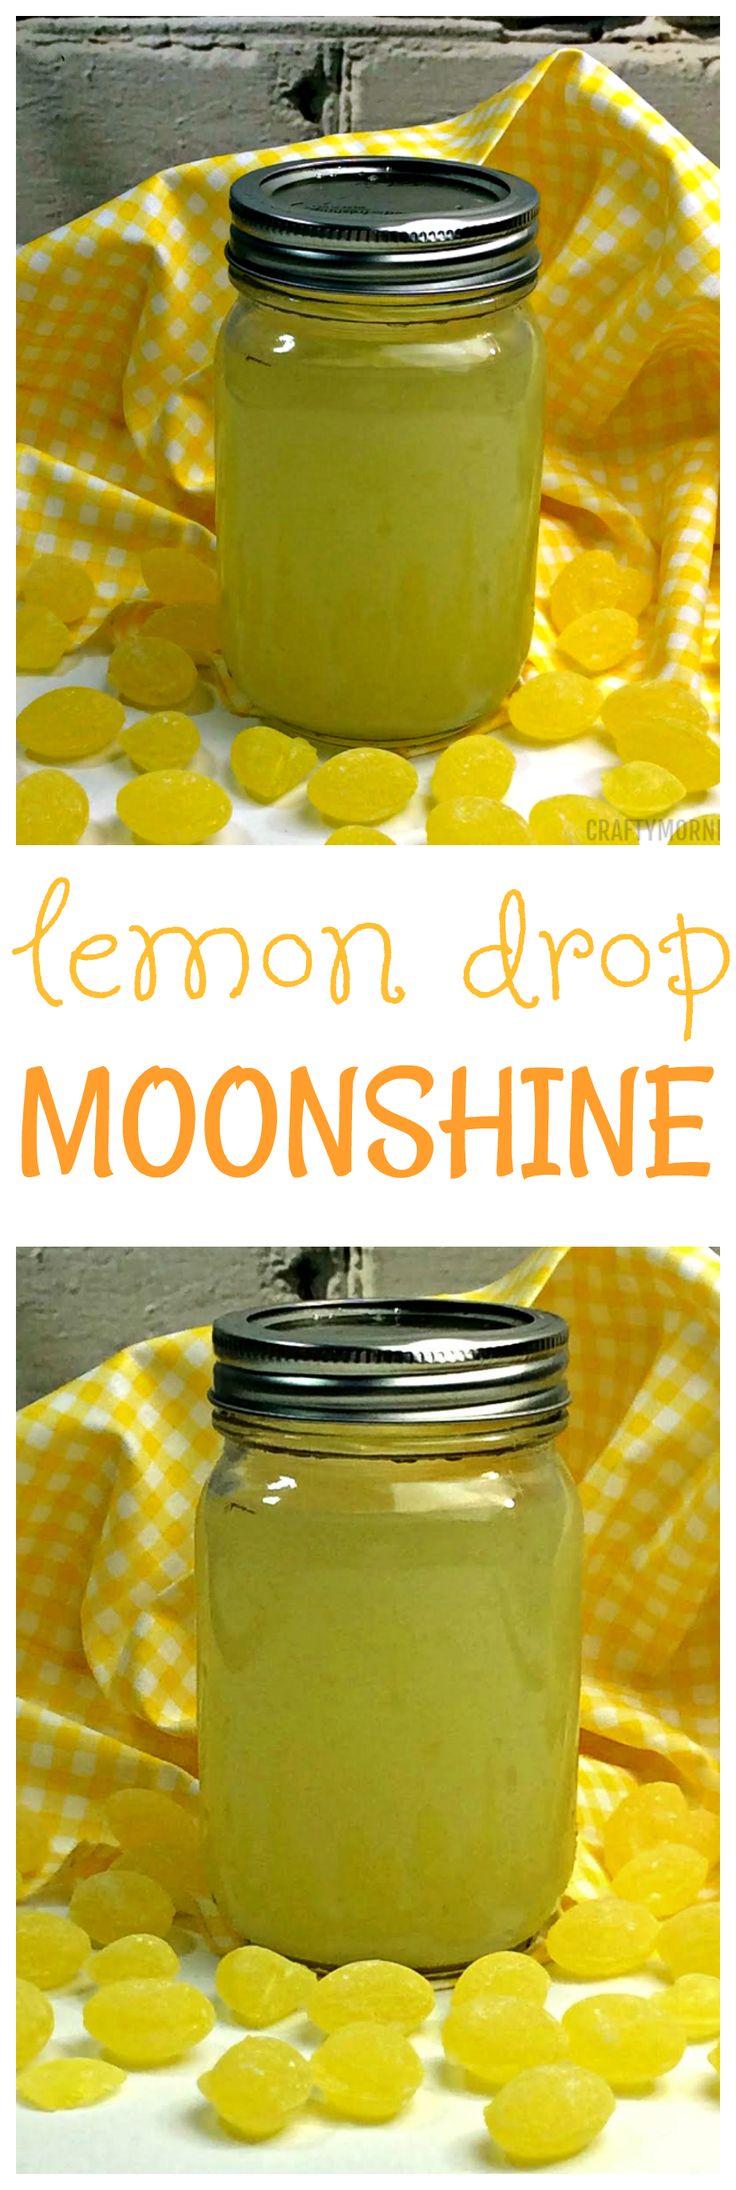 Lemon drop moonshine recipe...so good for summer BBQs!